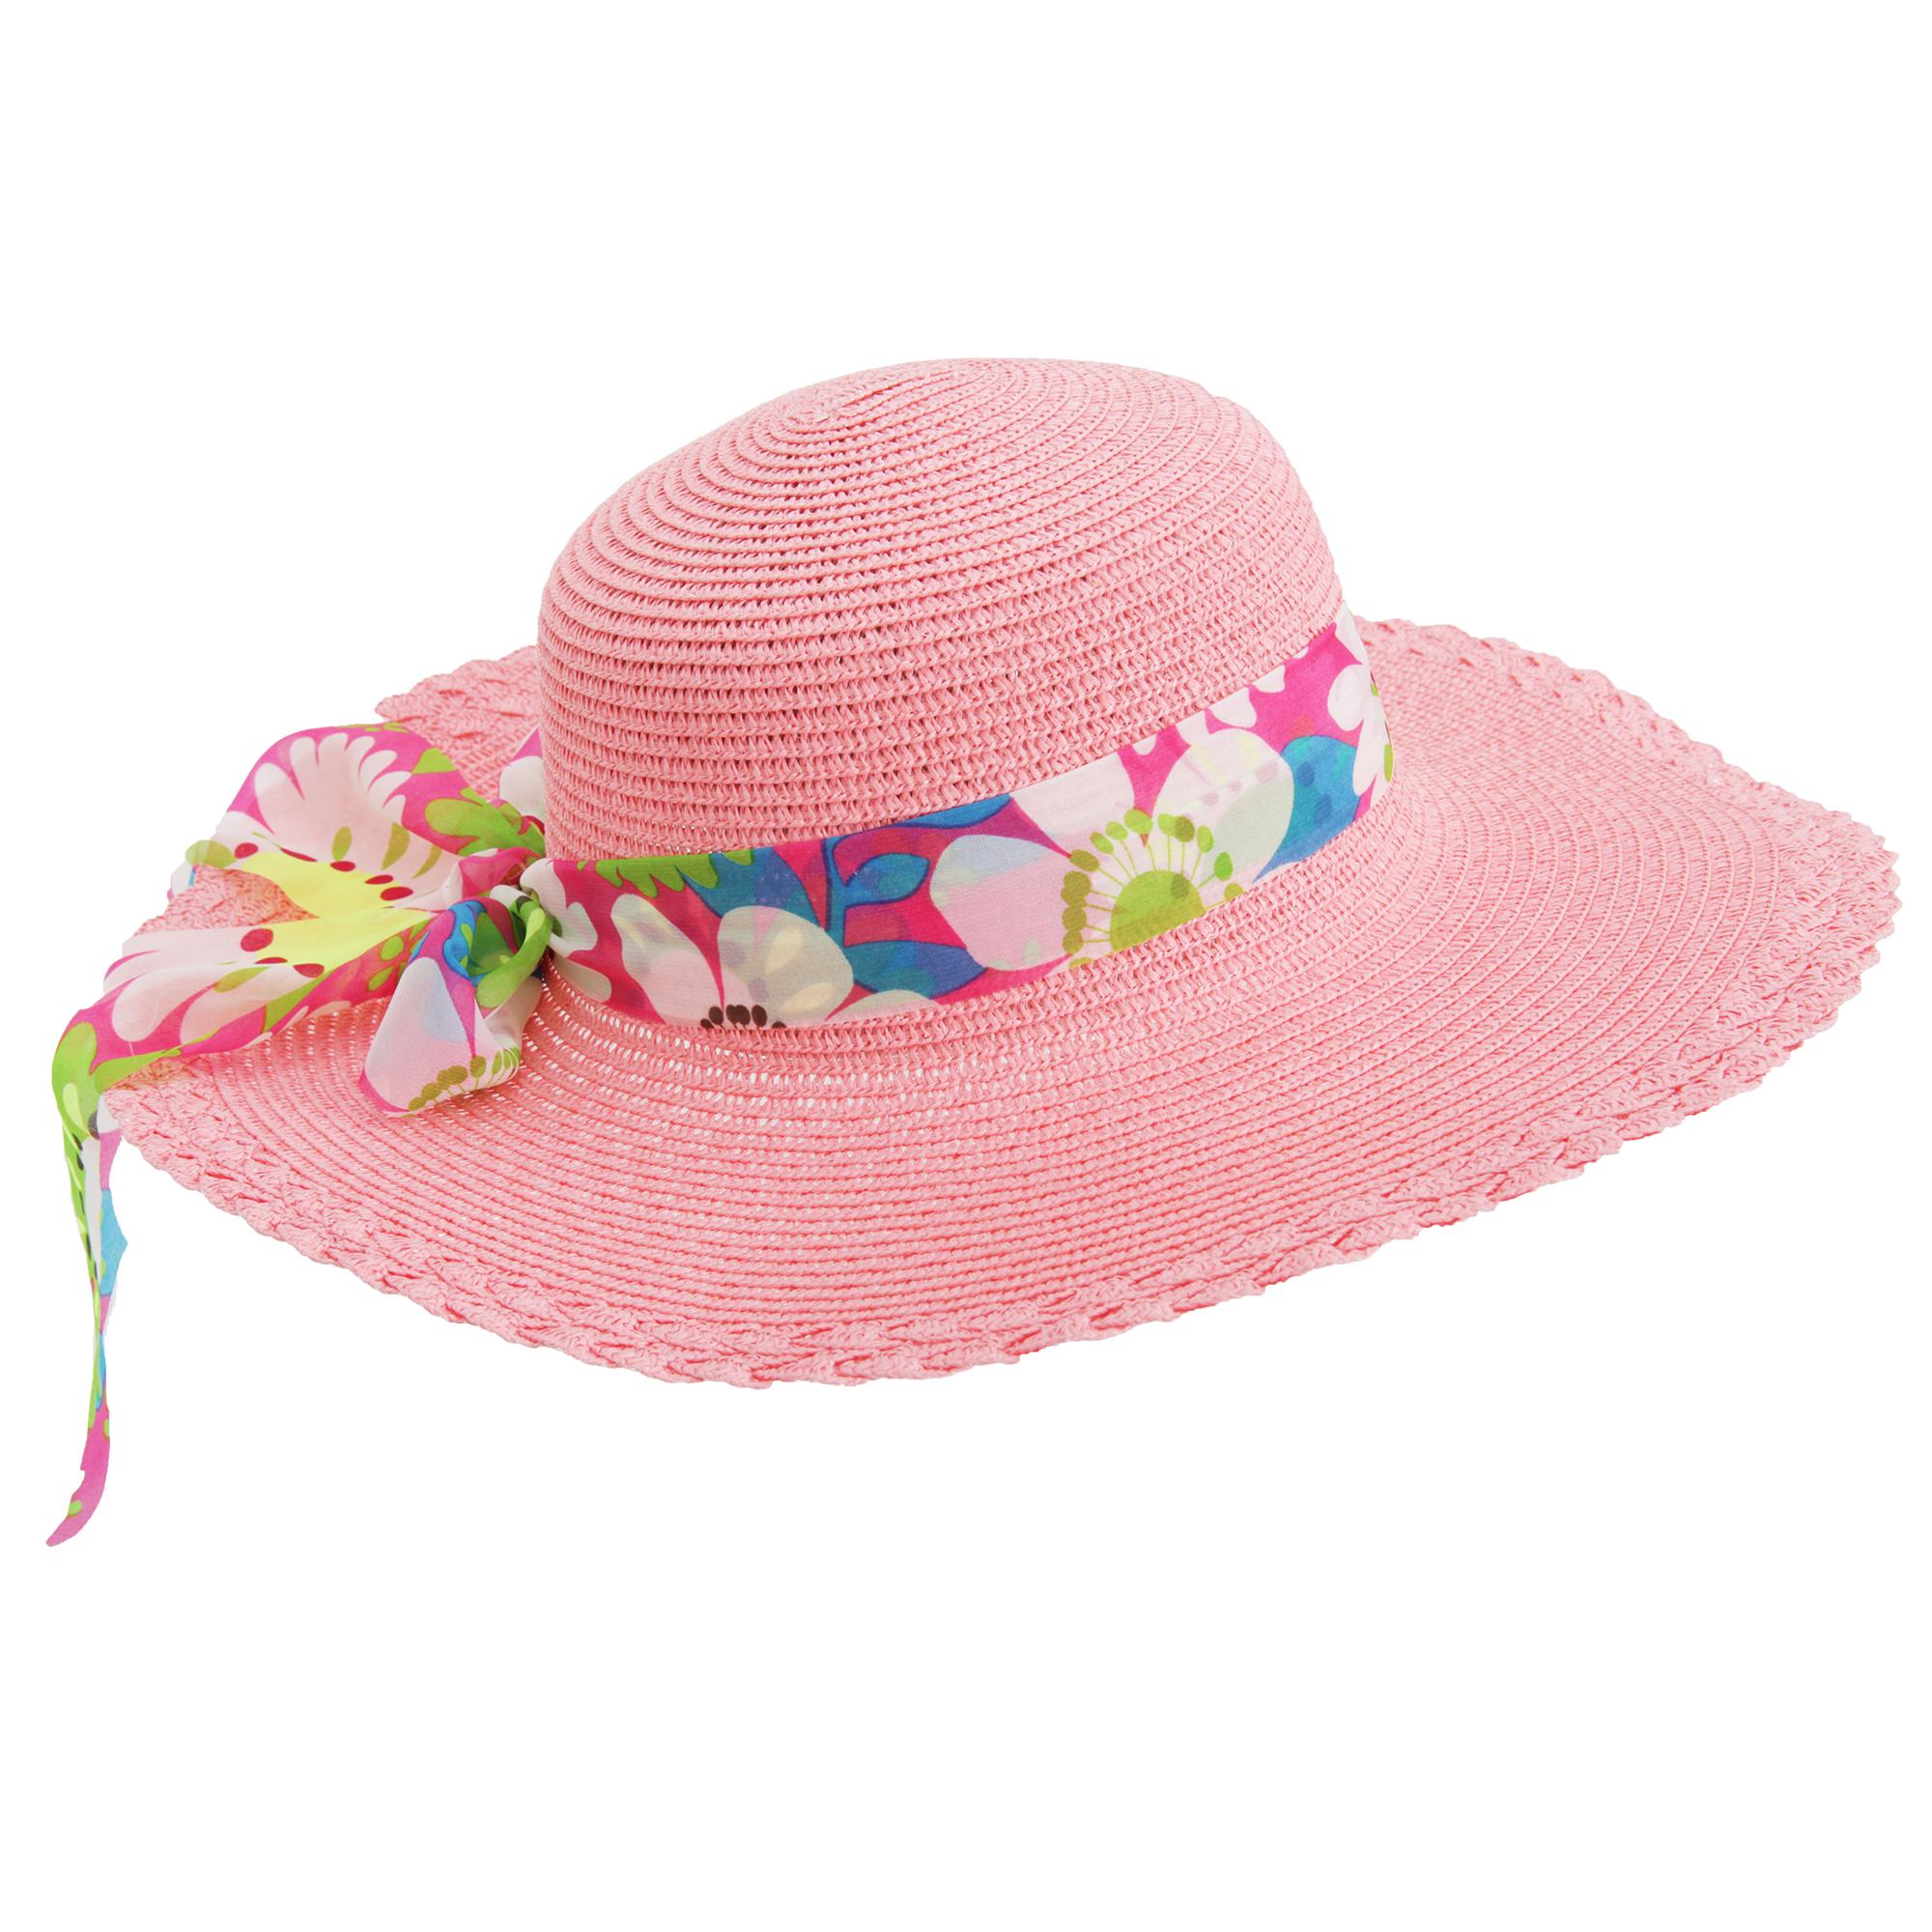 Womens Ladies Floppy Wide Brim Sun Hat With Floral Ribbon (HA523)  19f479e2eaed